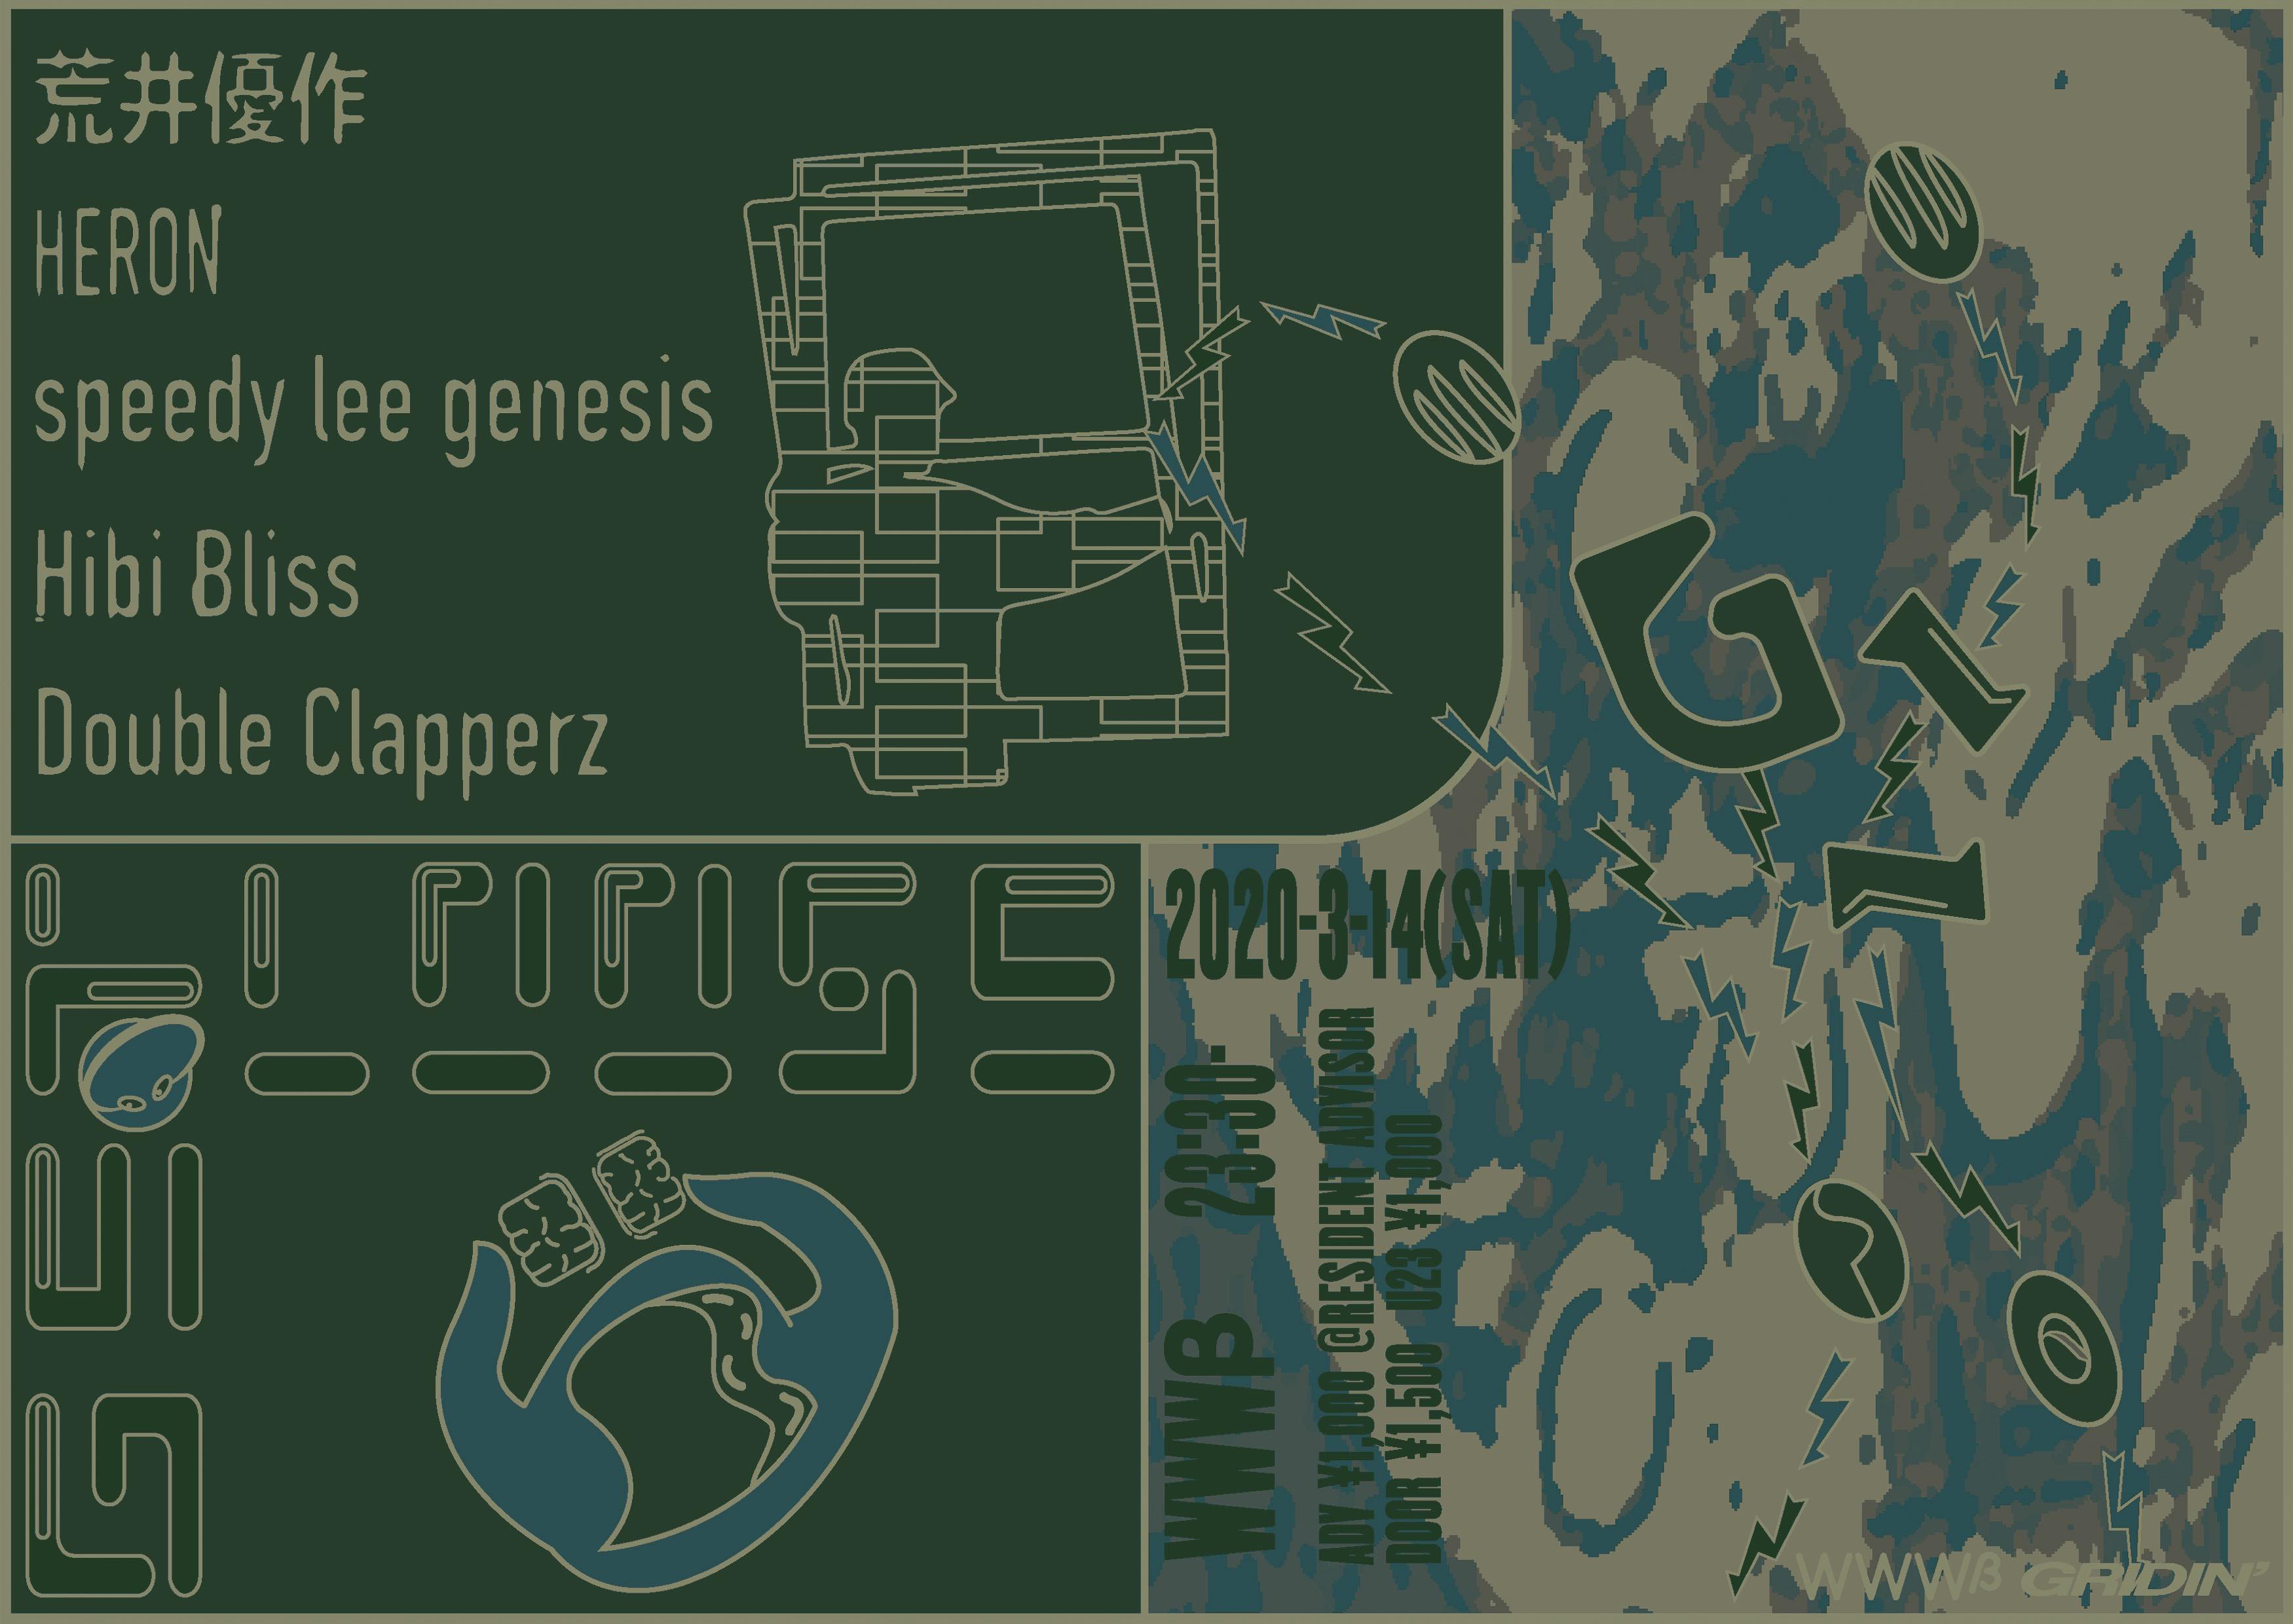 【公演延期】荒井優作 / HERON / speedy lee genesis - have-nots emo jap hiphop set -  / Hibi Bliss / Double Clapperz